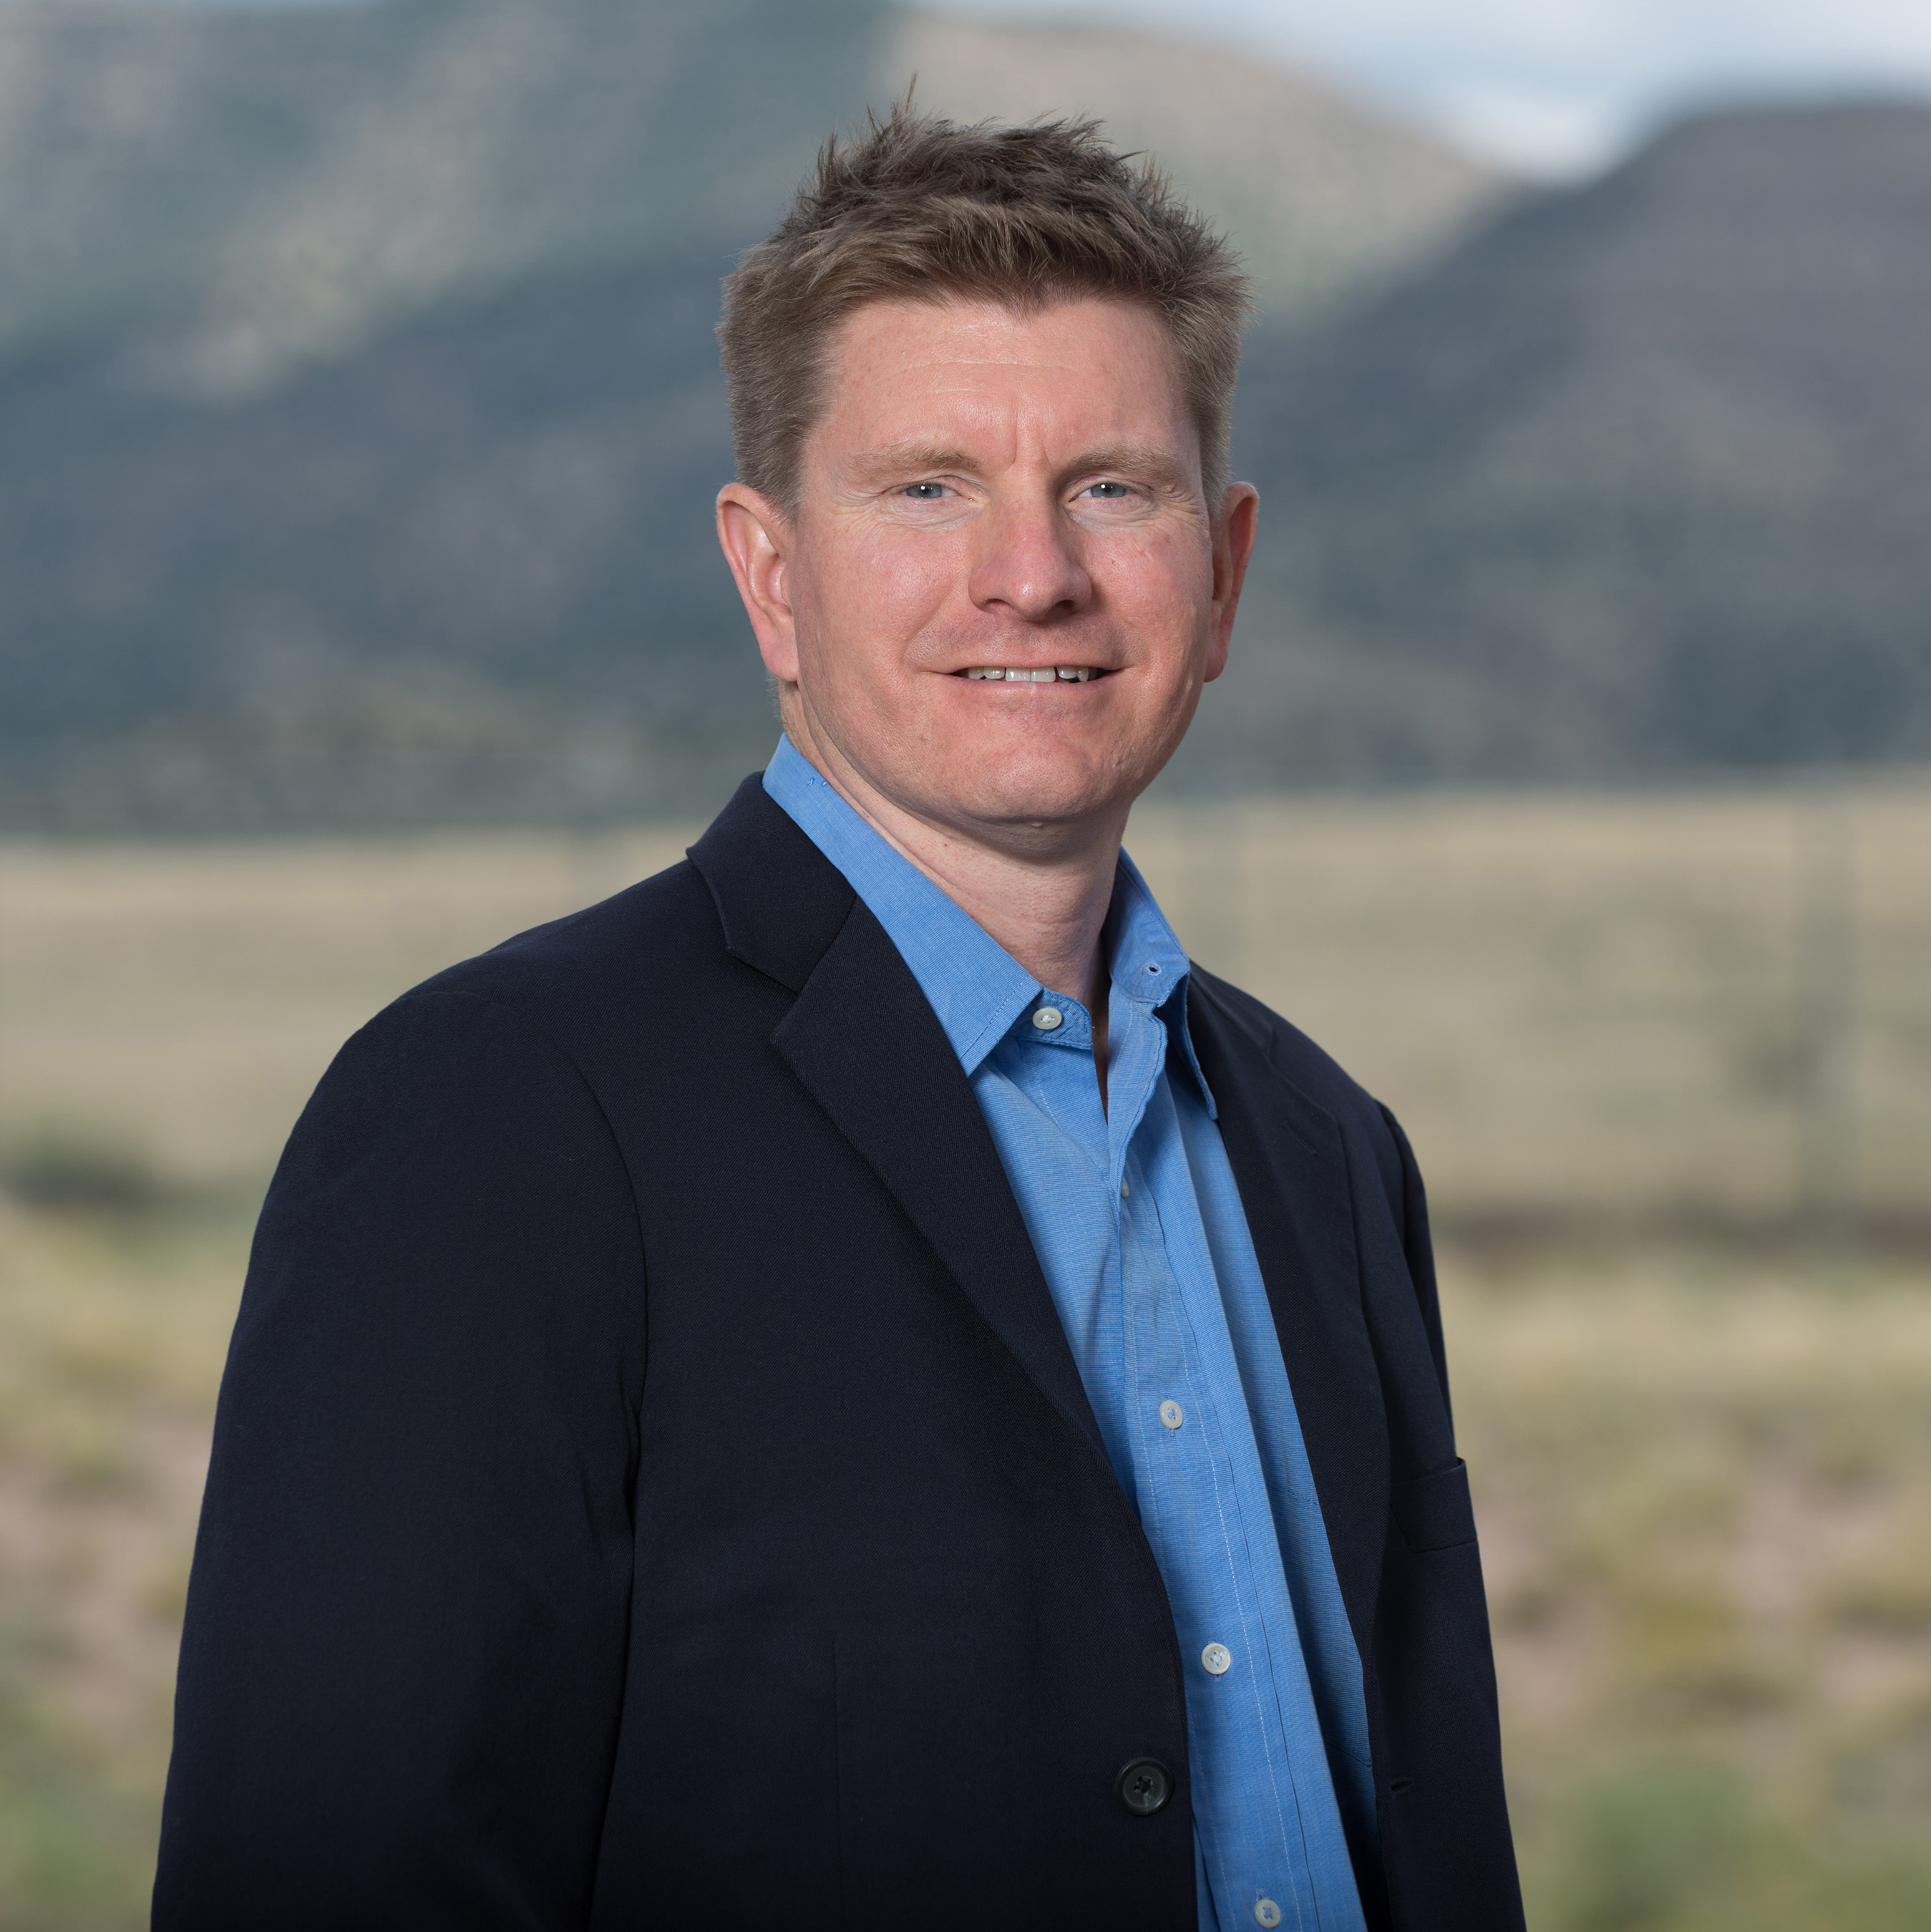 Dr. Ted Barrett